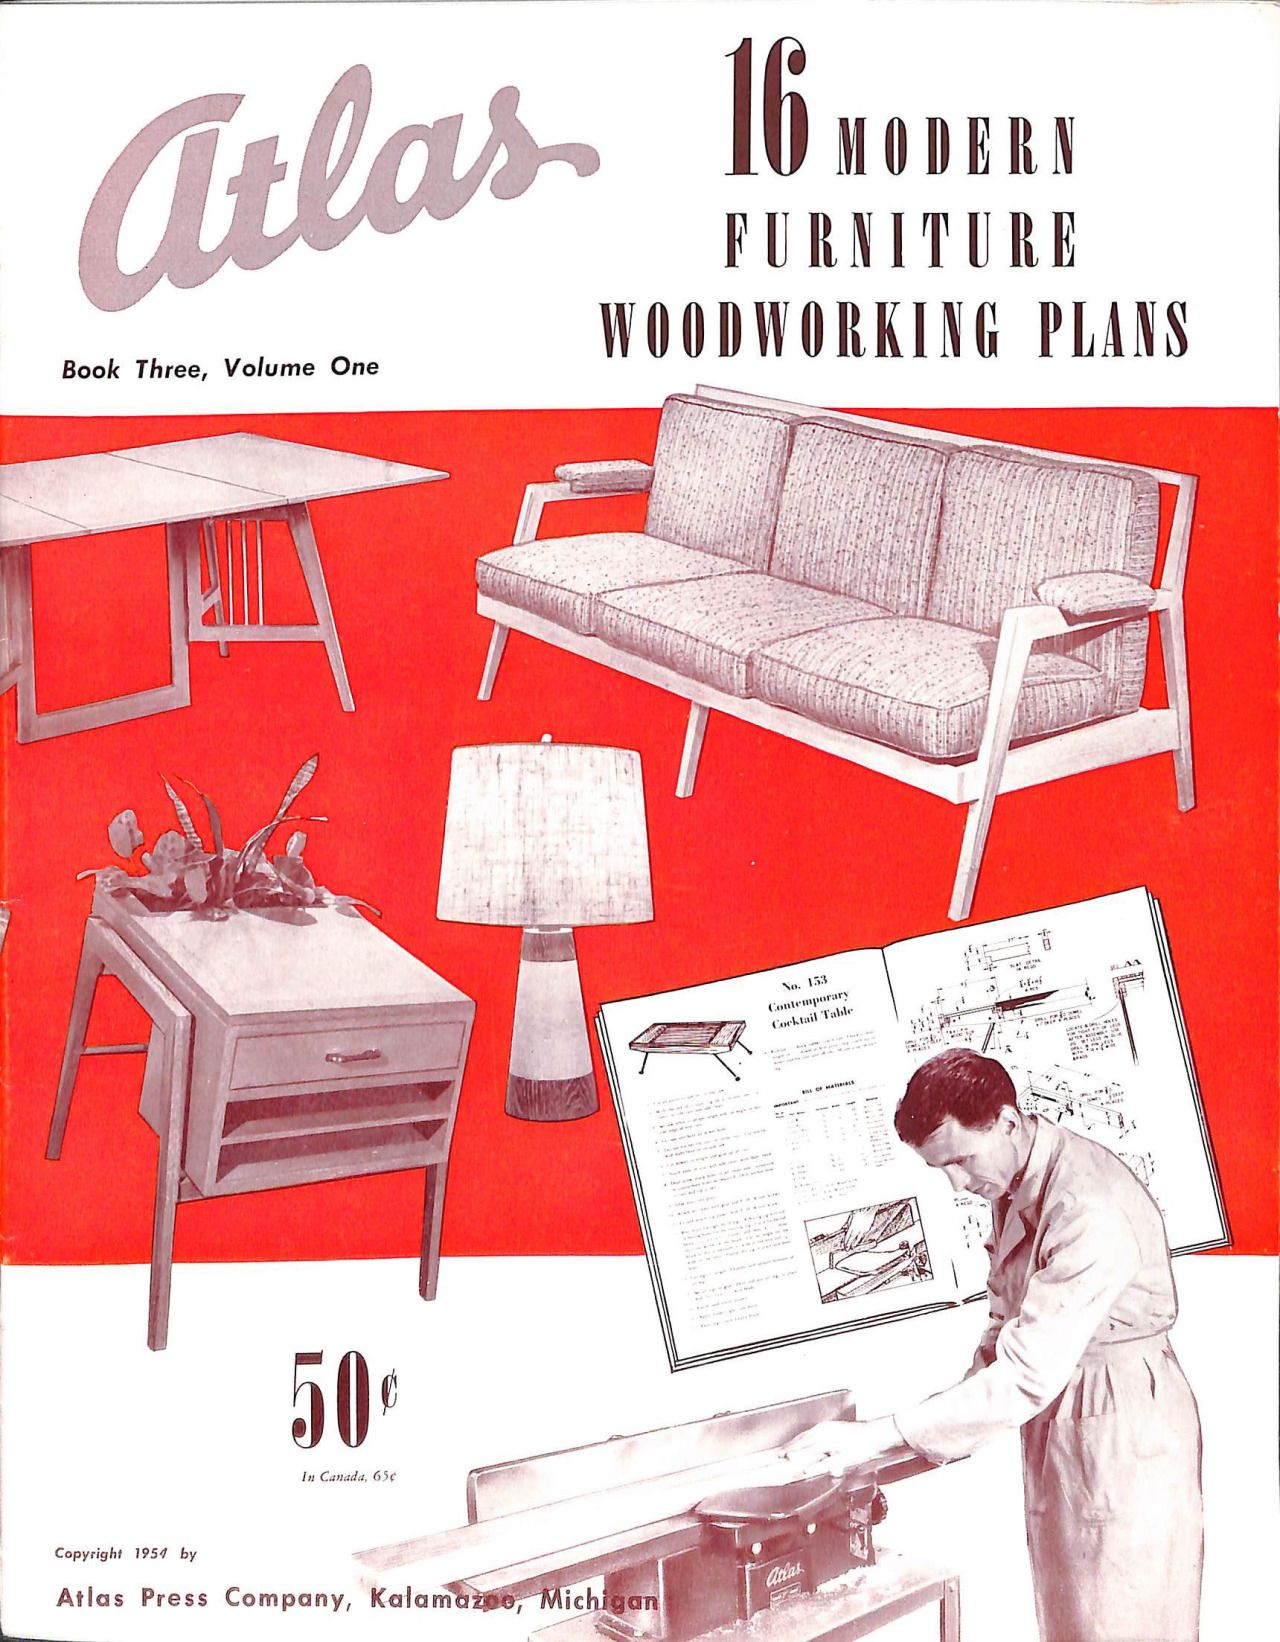 woodworking plans modern furniture. furniture 16 modern woodworking plans n